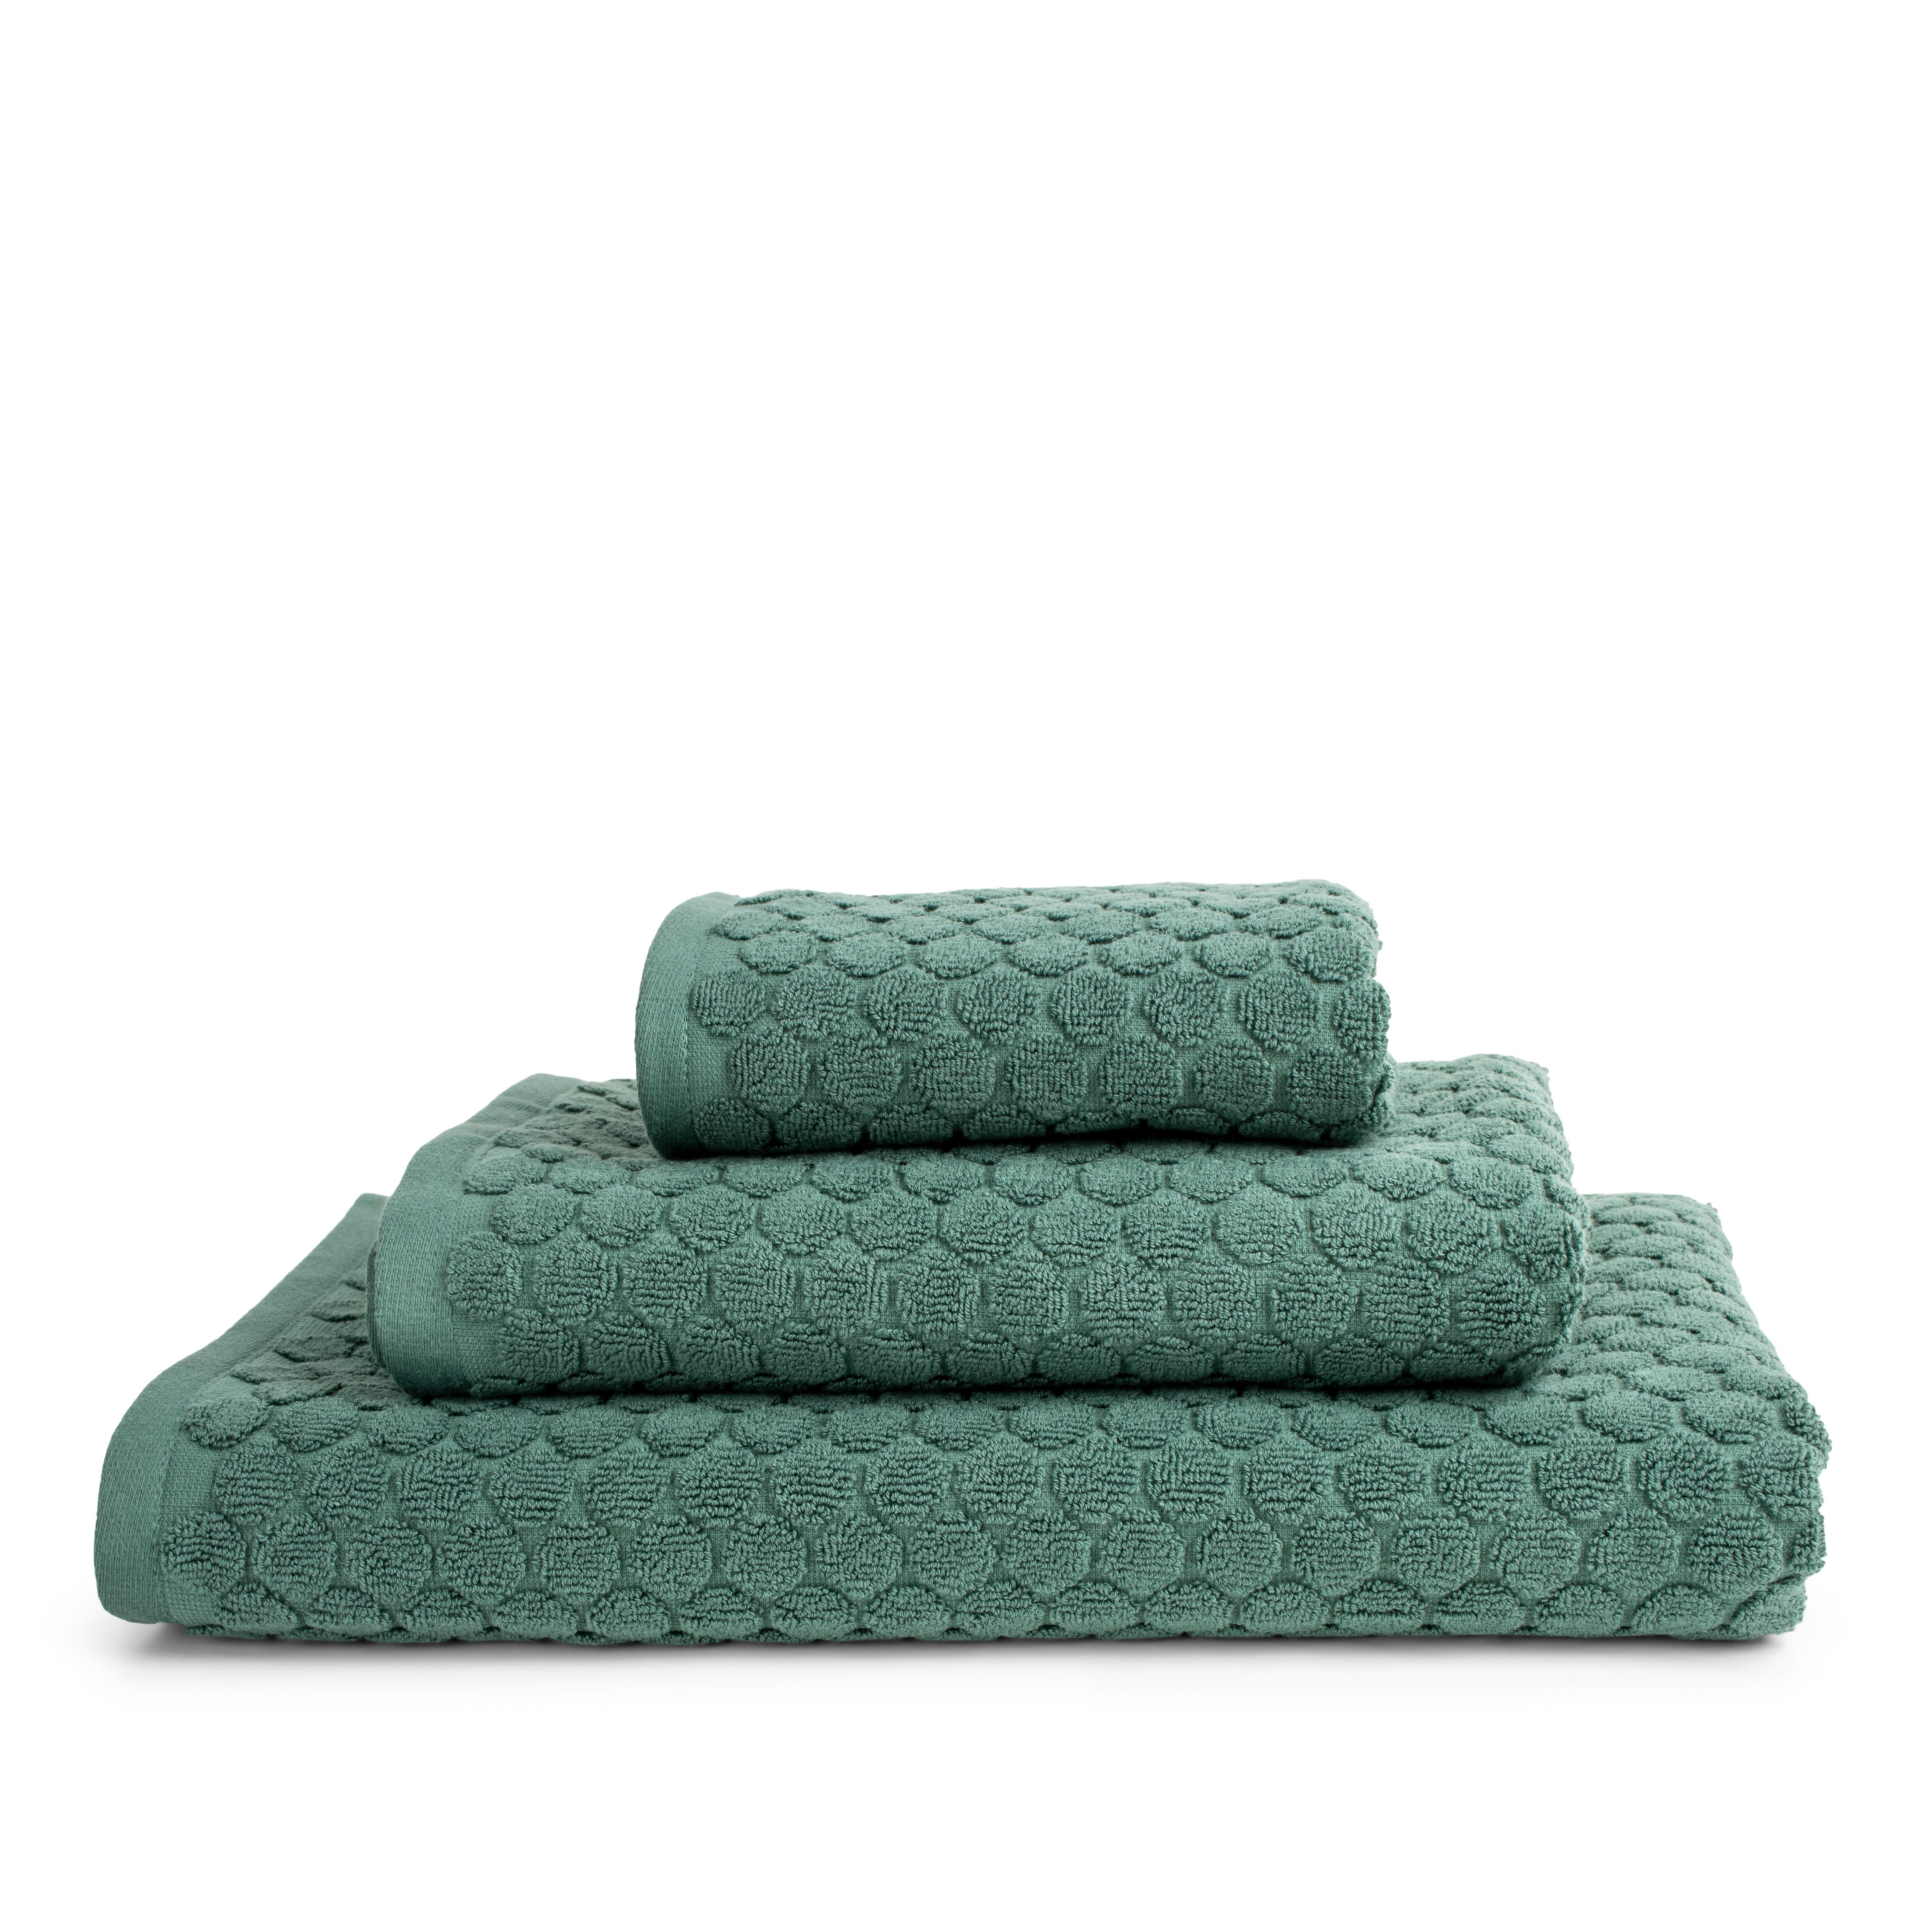 Nordstrand Classic Dot håndklæde, 70x140 cm, støvet grøn